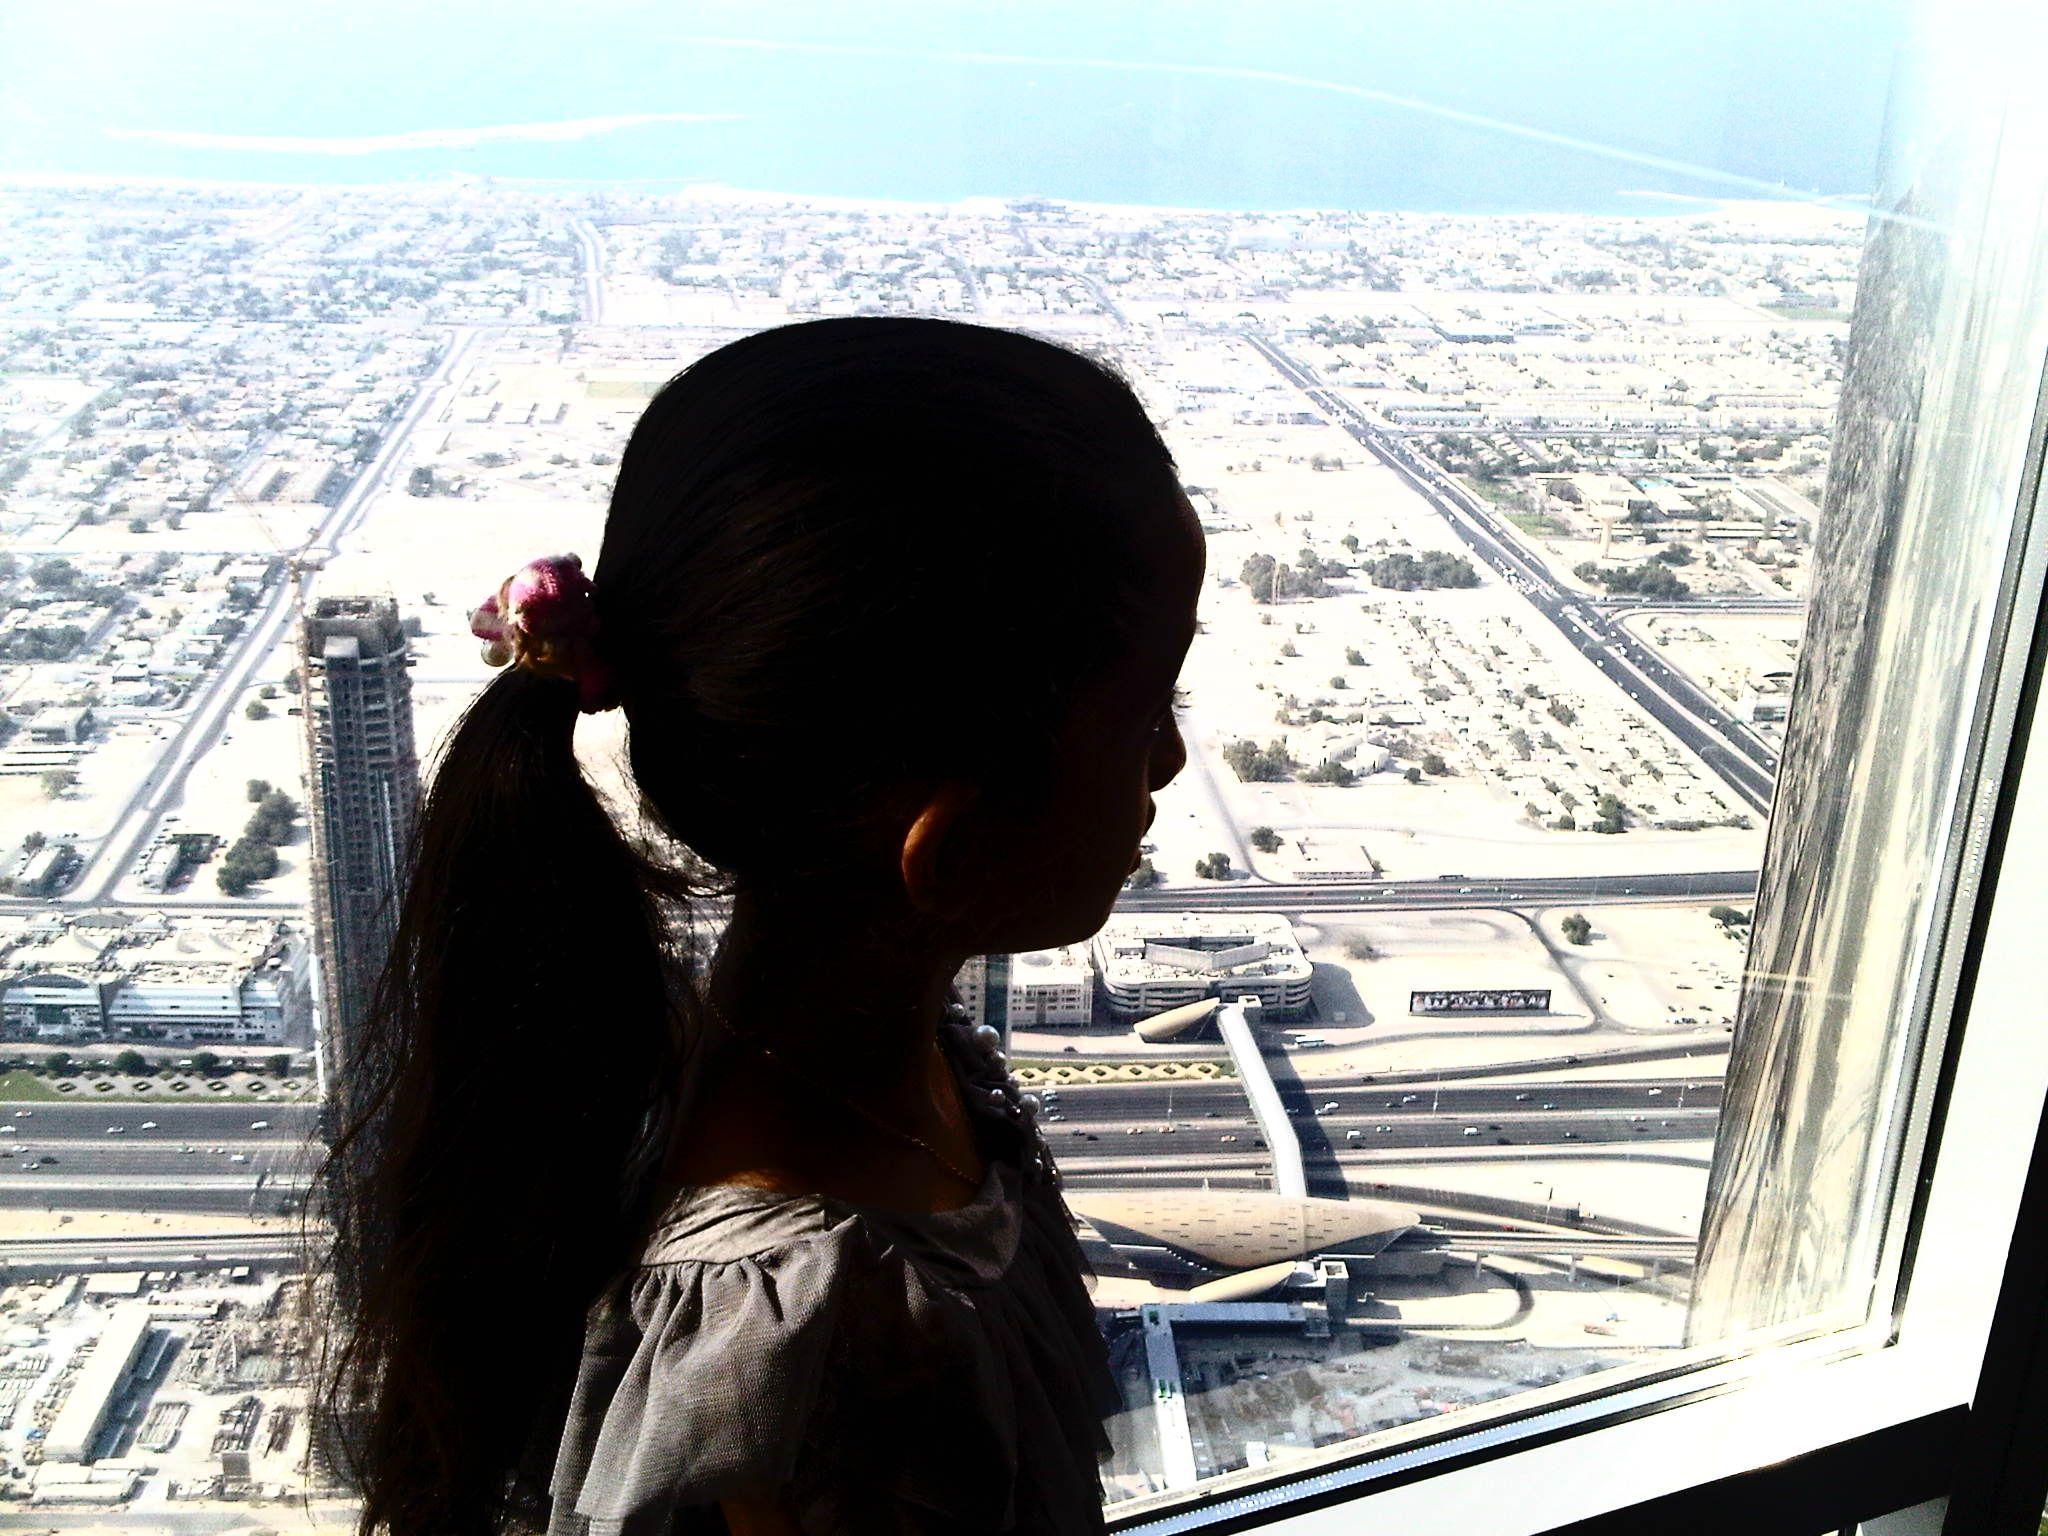 #SATHAR AL KARAN # DUBAI # MYDUBAI # ABUDHABI # KERALA # UAE # INDIA # EVENTS # AWARDS # CONCERTS # NETWORKING # CELEBRITIES # ROYAL FAMILY